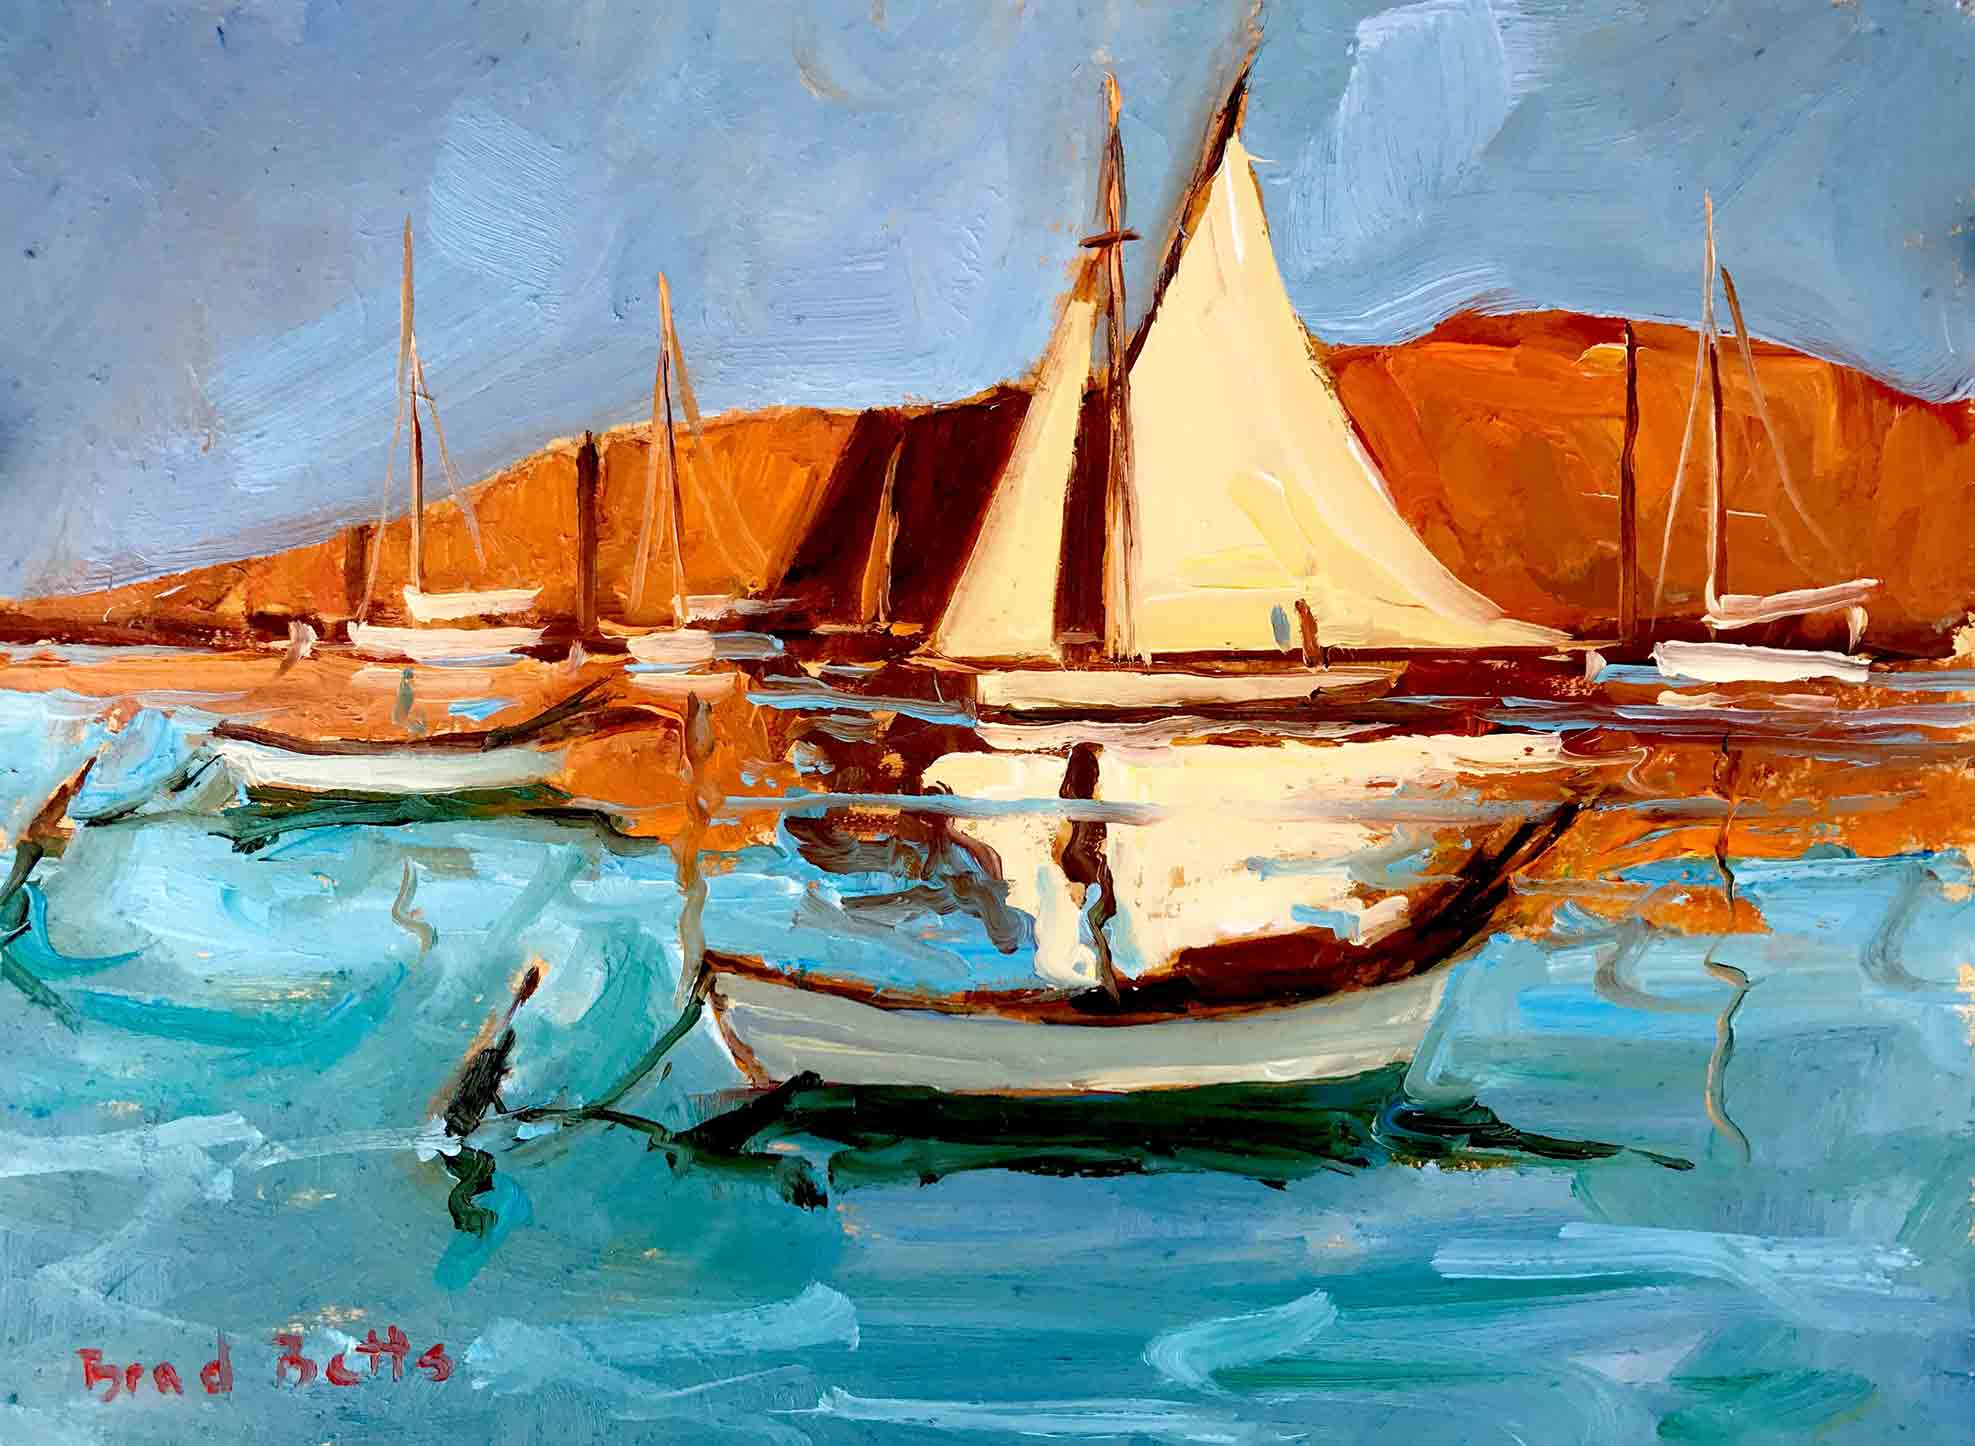 Boats-off-Smuttynose_web.jpg